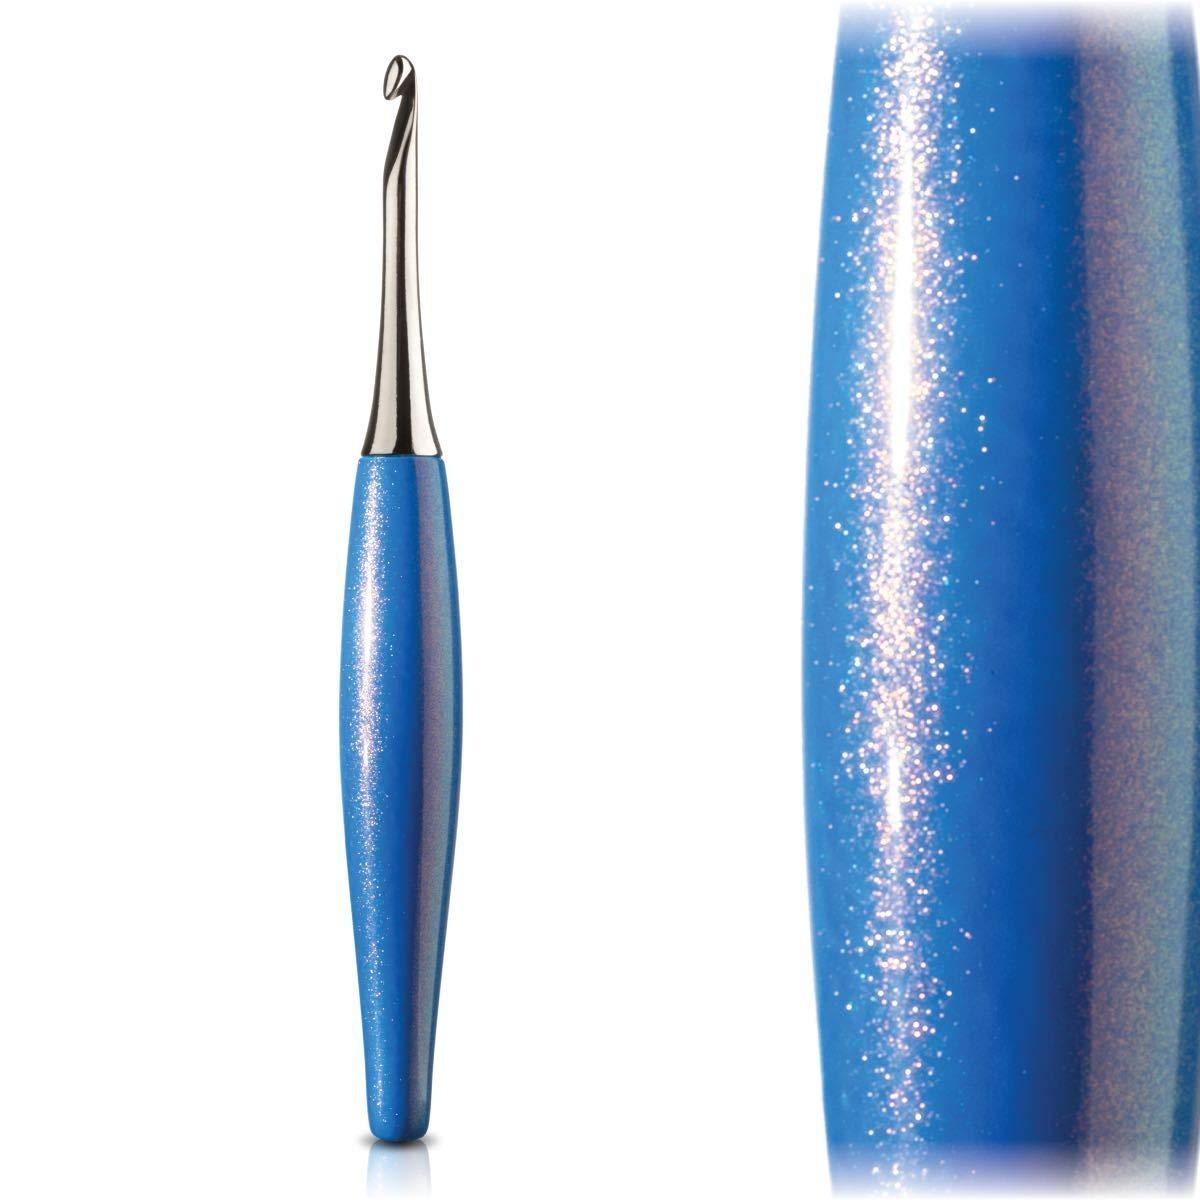 Furls Odyssey Crochet Hook Nickel Plated Tip for Effortless Glide, Blue Ergonomic Handle I - 5.5mm